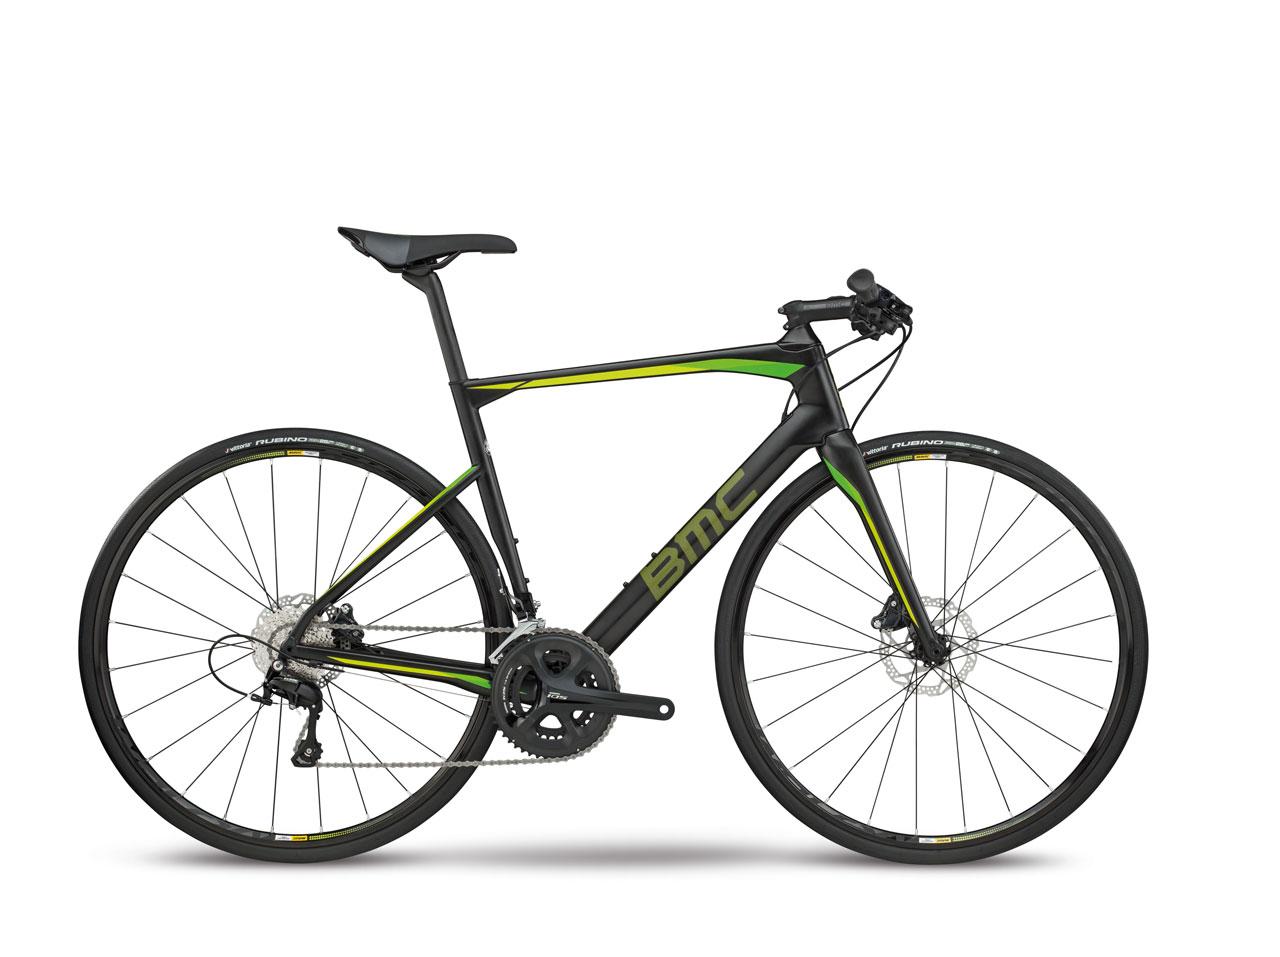 WANT TO WIN A BMC BIKE? - Cadel Evans Great Ocean Road Race